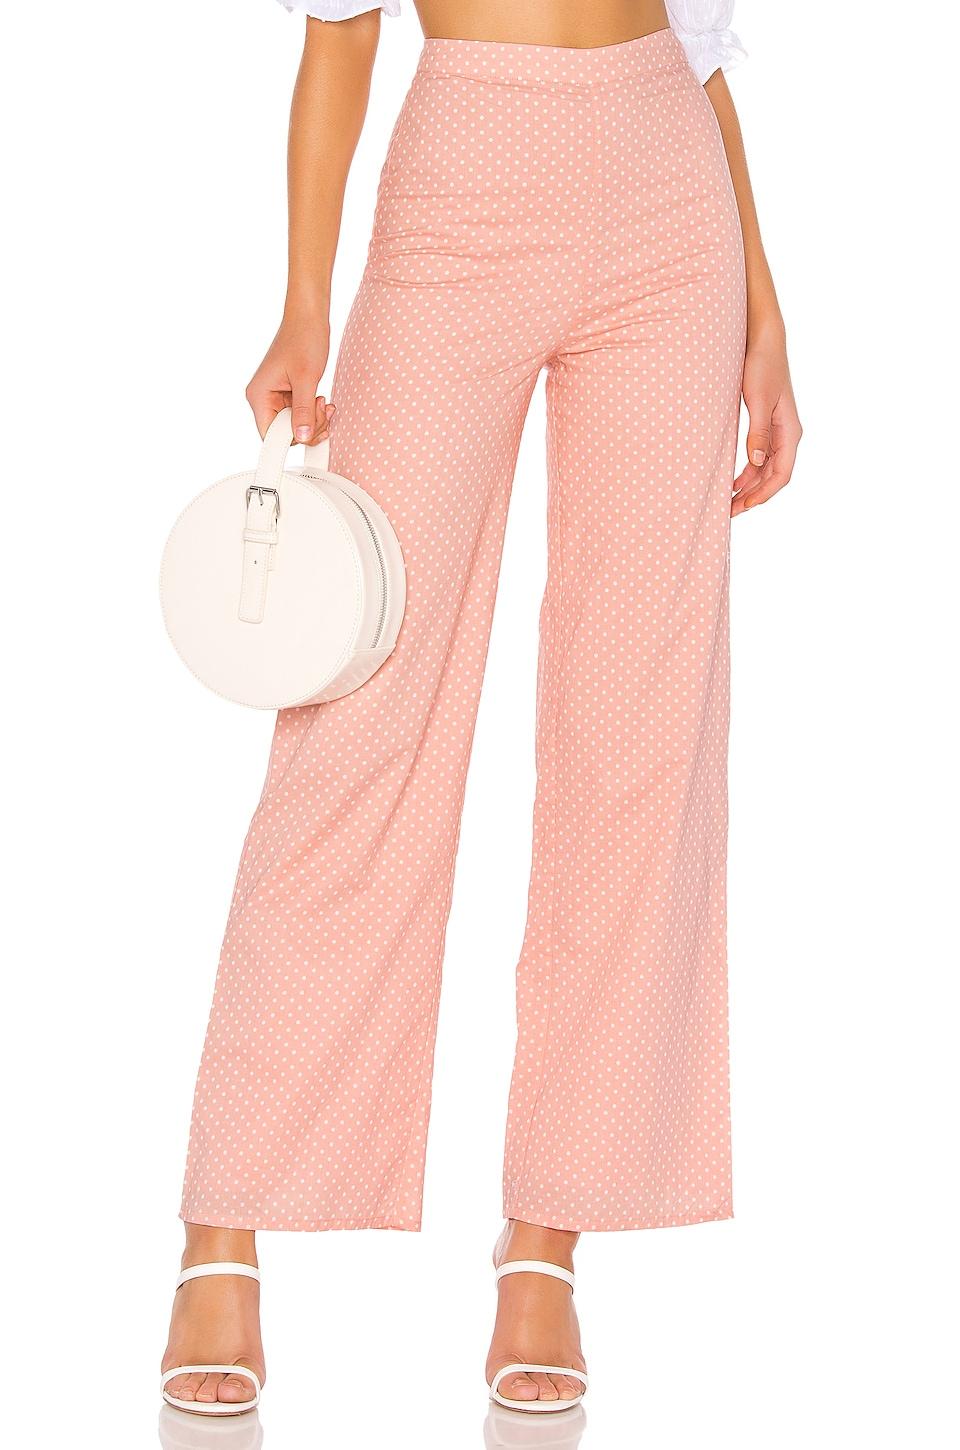 MAJORELLE Brandy Pants in Pink Dot